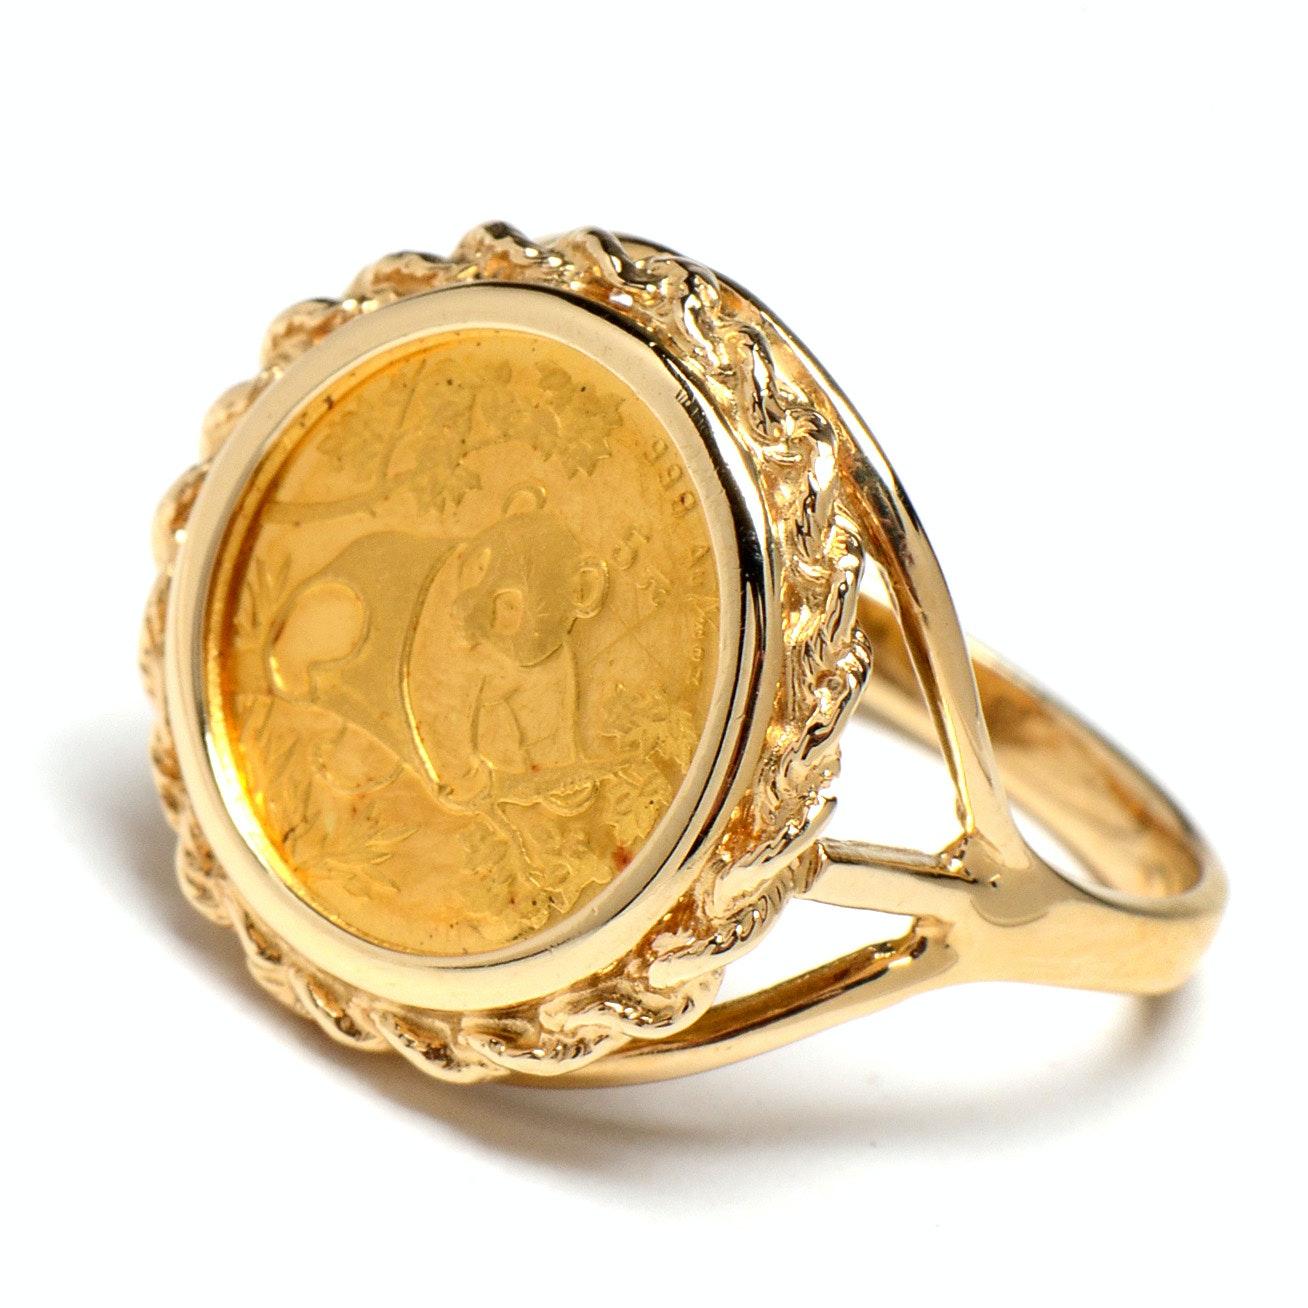 14K Yellow Gold Signet Ring with 24K Gold Chinese 5 Yuan Panda Coin